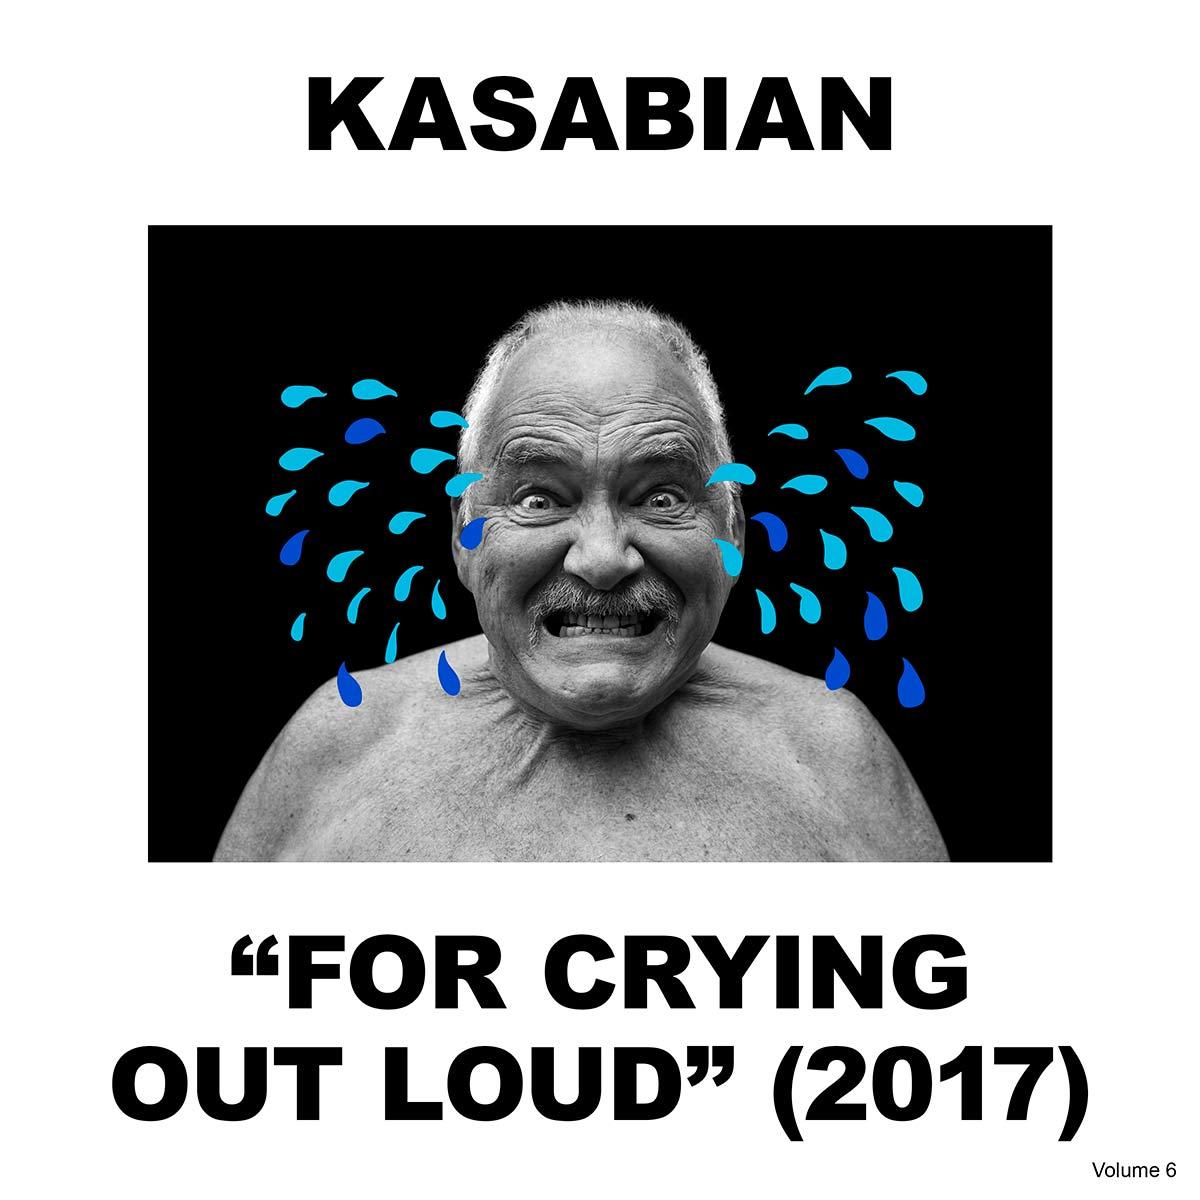 kasabian-crying-out-loud